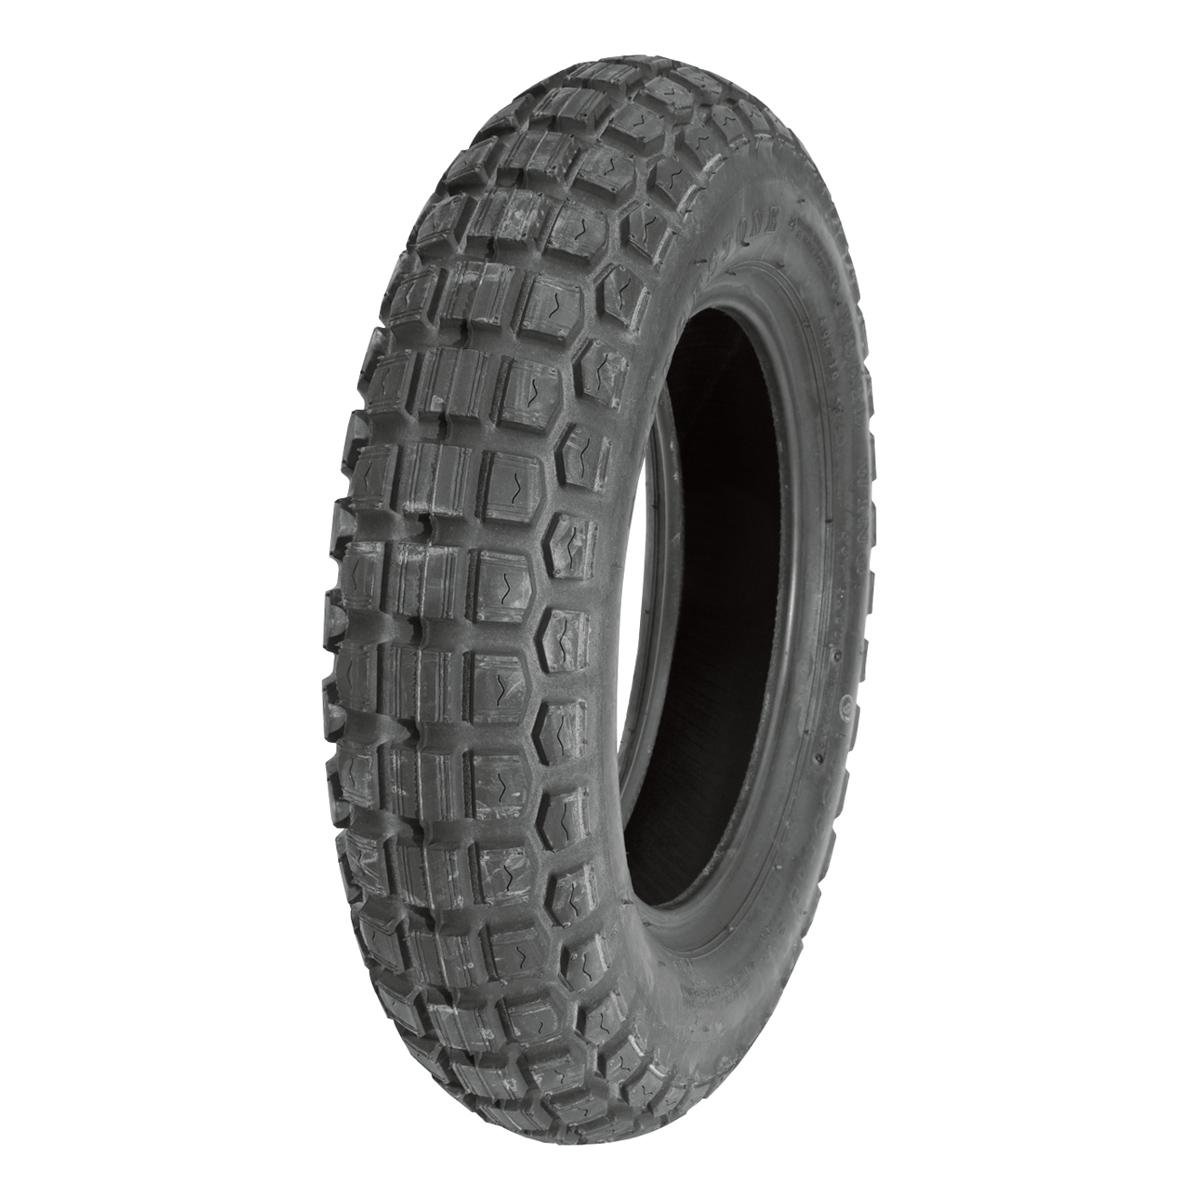 Bridgestone TW 4.00-10 Front/Rear Tire